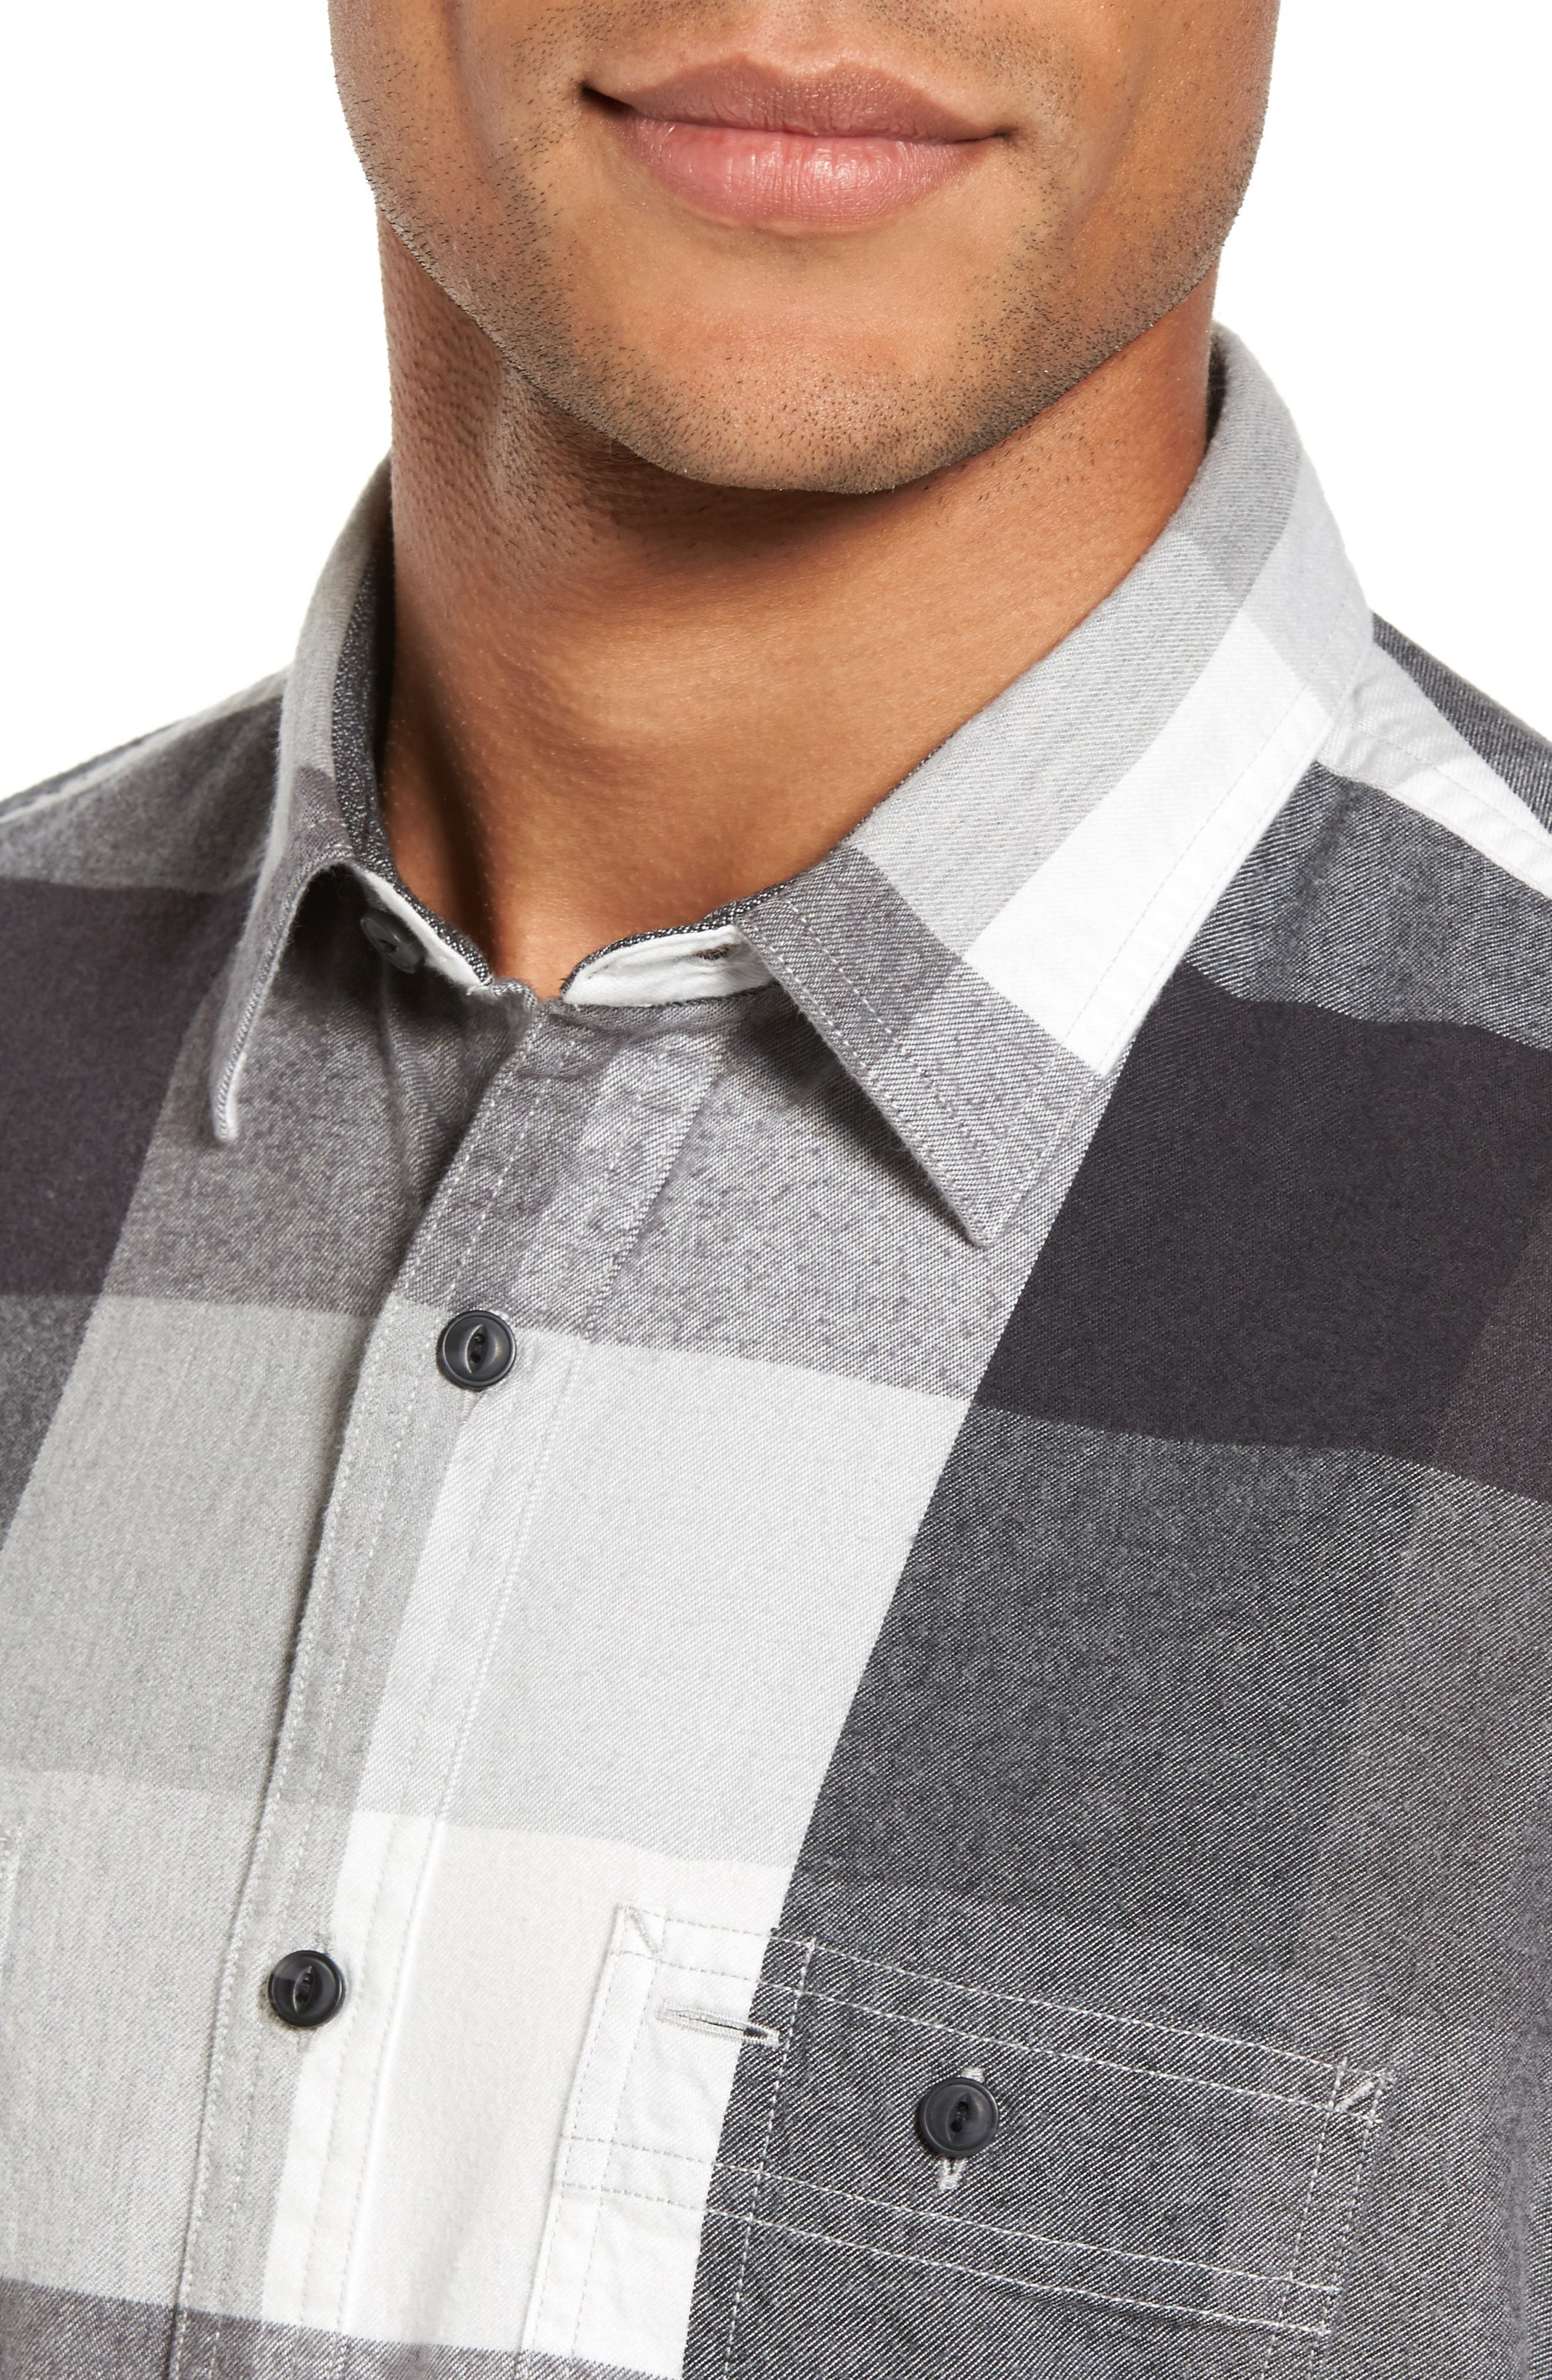 Trim Fit Workwear Check Flannel Shirt,                             Alternate thumbnail 4, color,                             Grey Paloma Buffalo Plaid